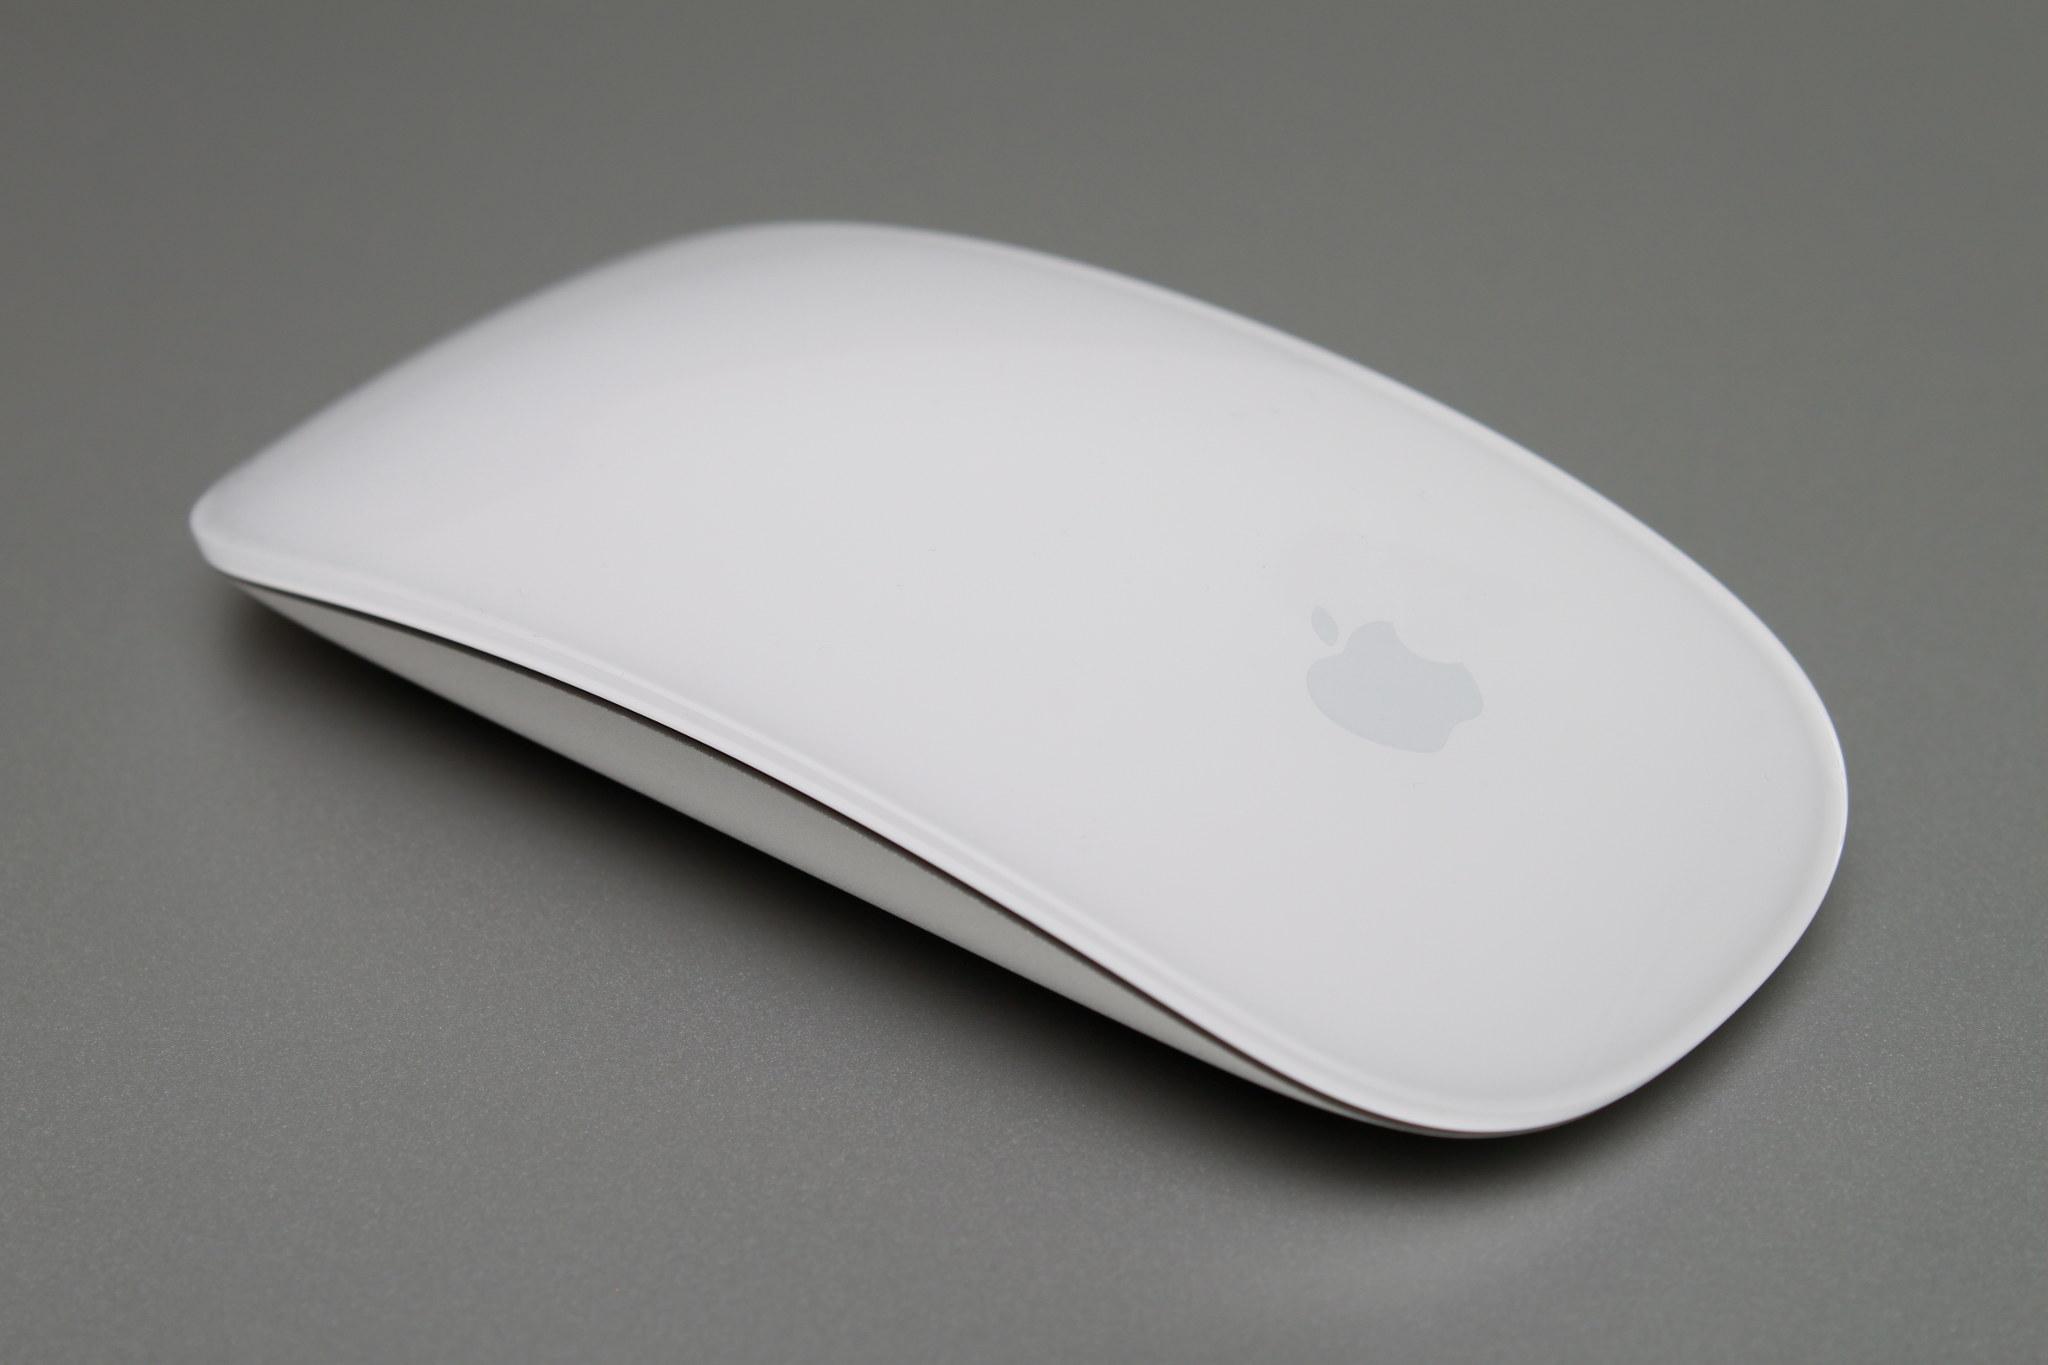 apple magic mouse unter ubuntu lucid linux und ich. Black Bedroom Furniture Sets. Home Design Ideas